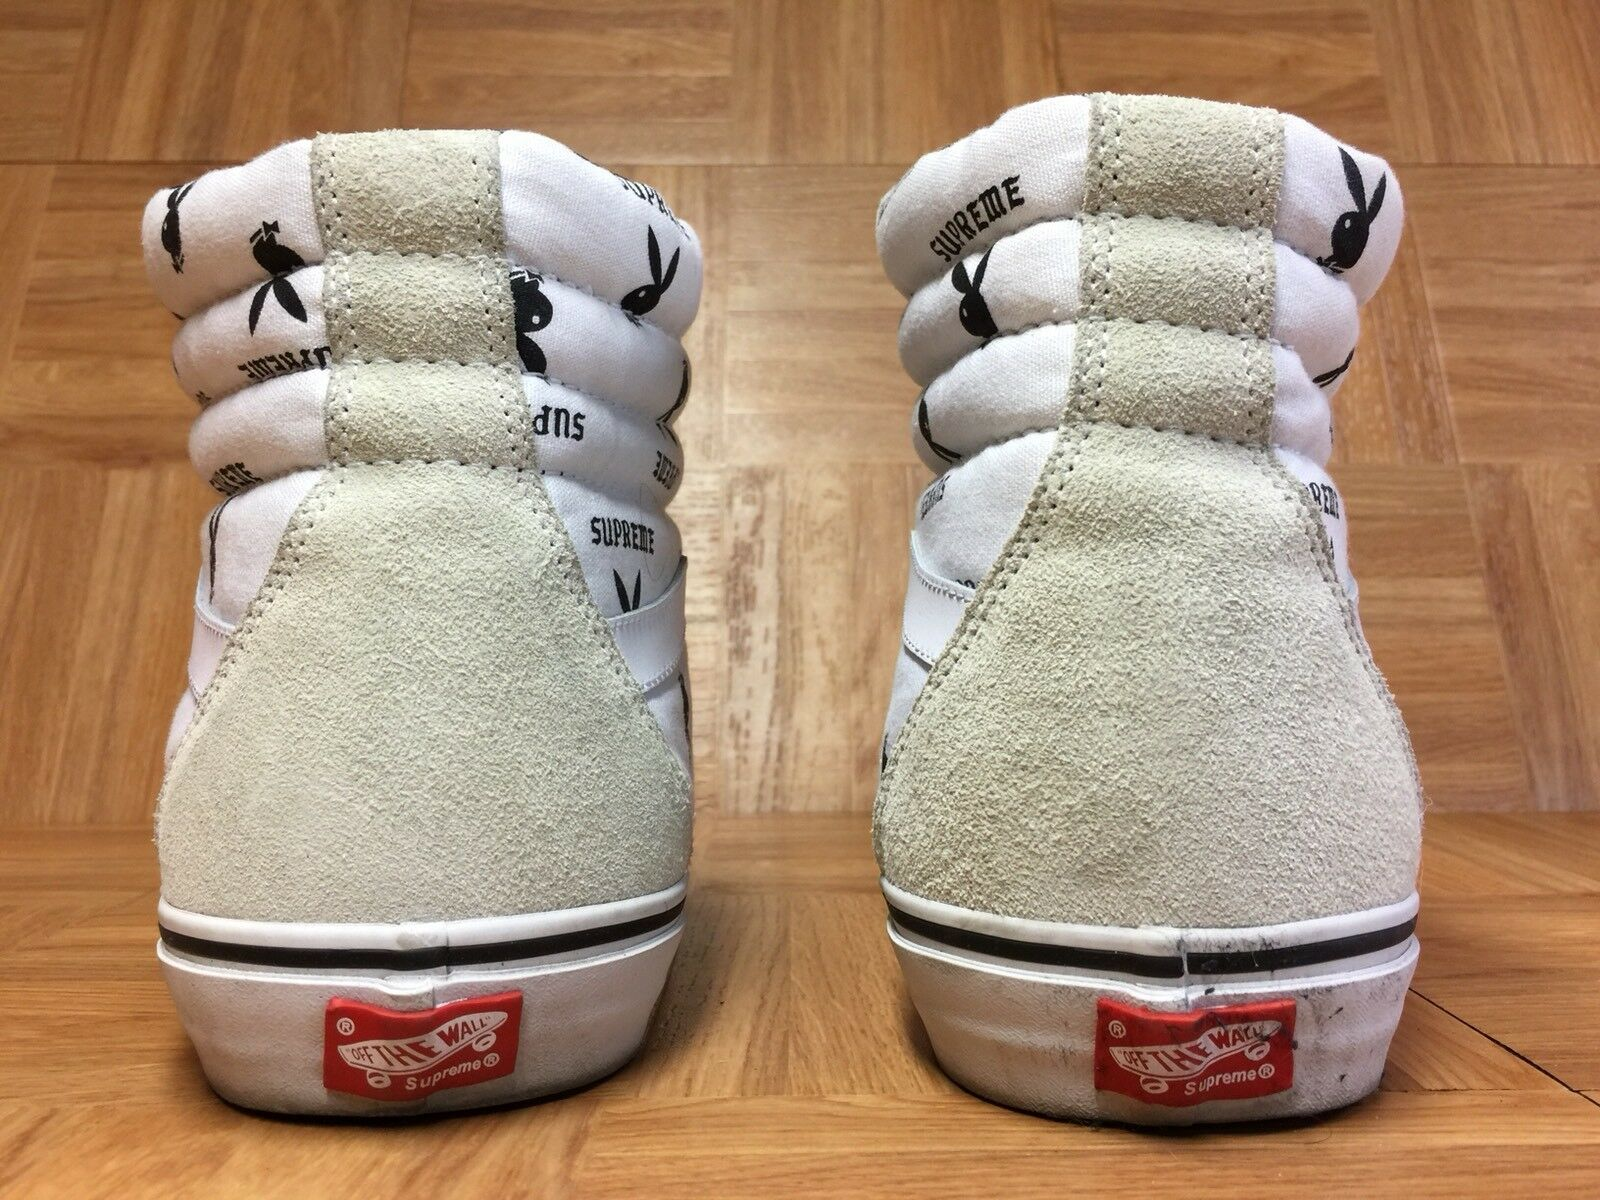 RARE VANS x Supreme x x x Playboy Sk8-Hi bianca Uomo Dimensione 13 scarpe Vintage Cool bf6d7a